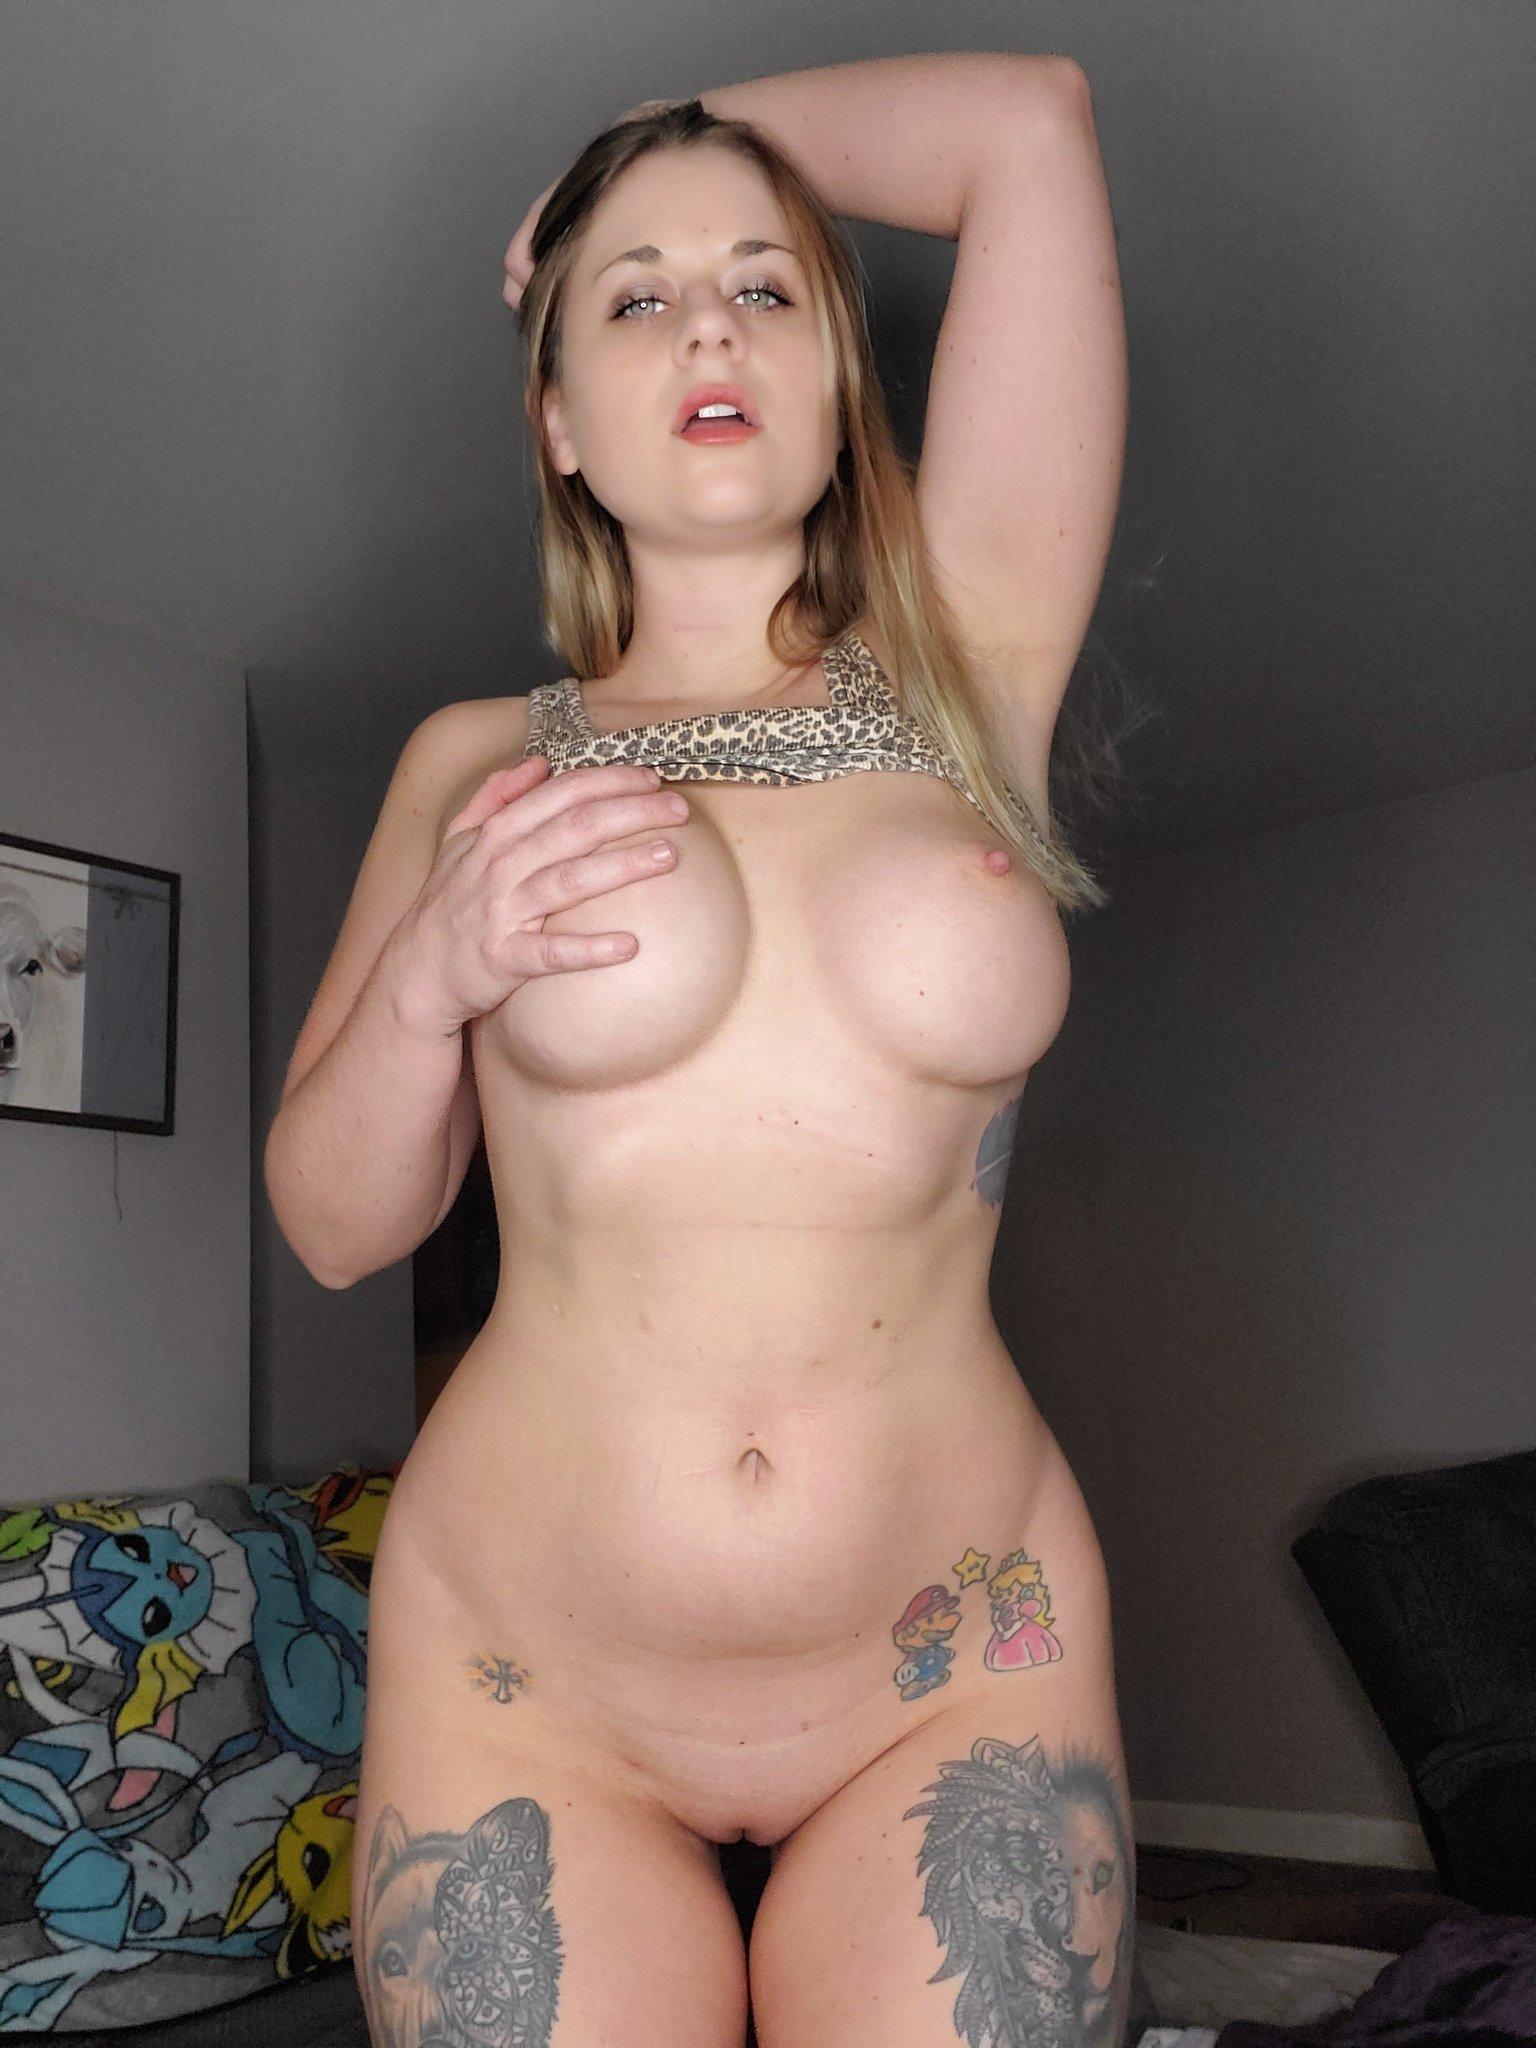 Lindsey Bubblgummbabe Sex Tape & Nude Leaked! 0004